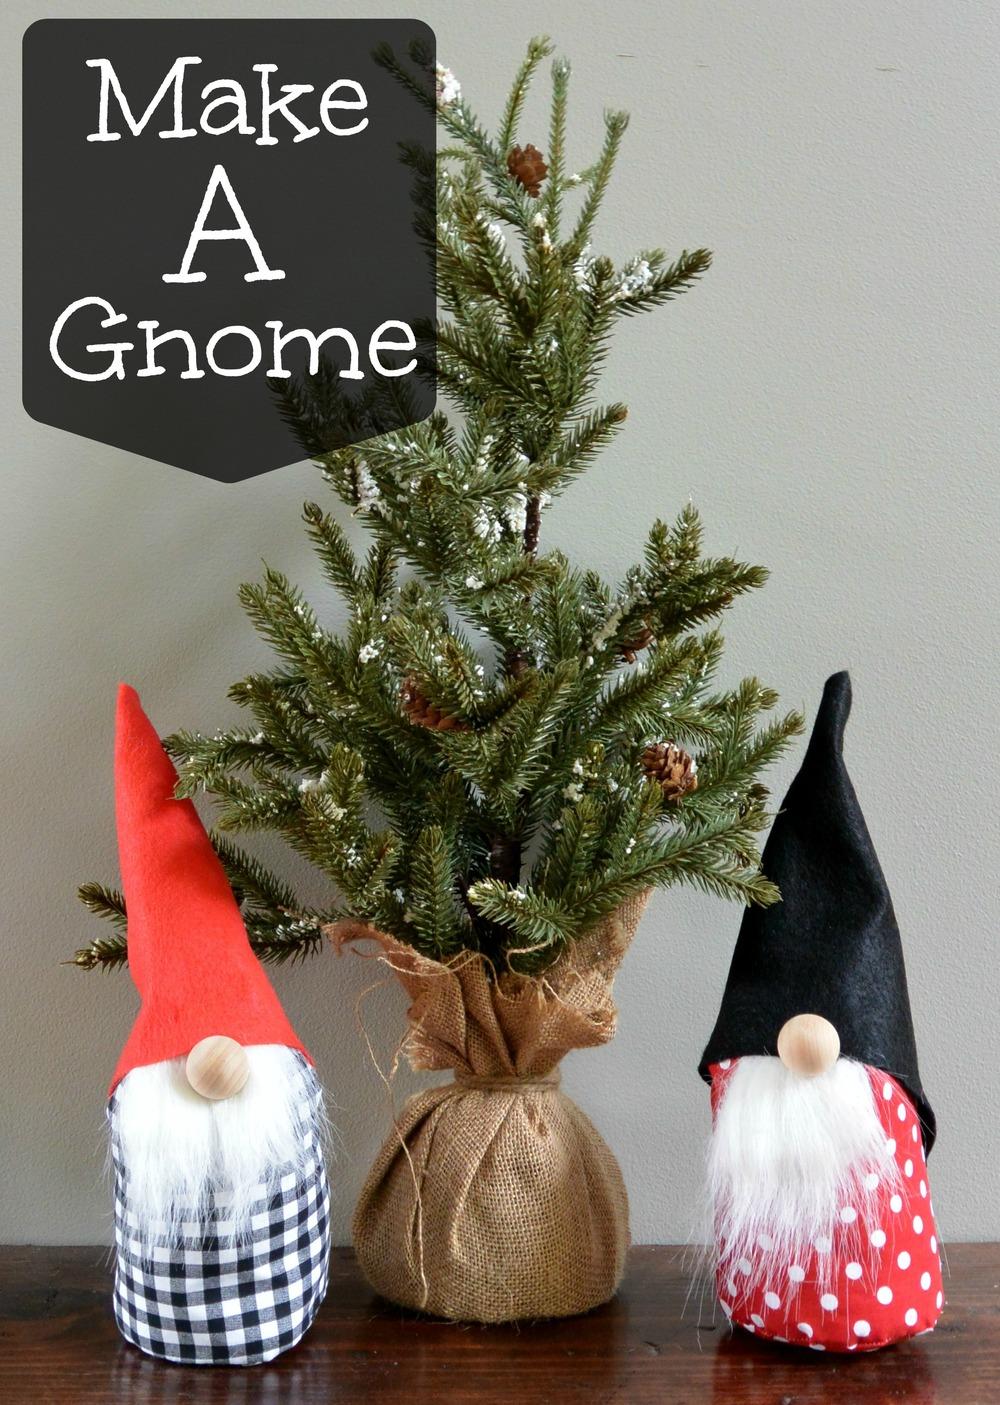 How to Make a Gnome